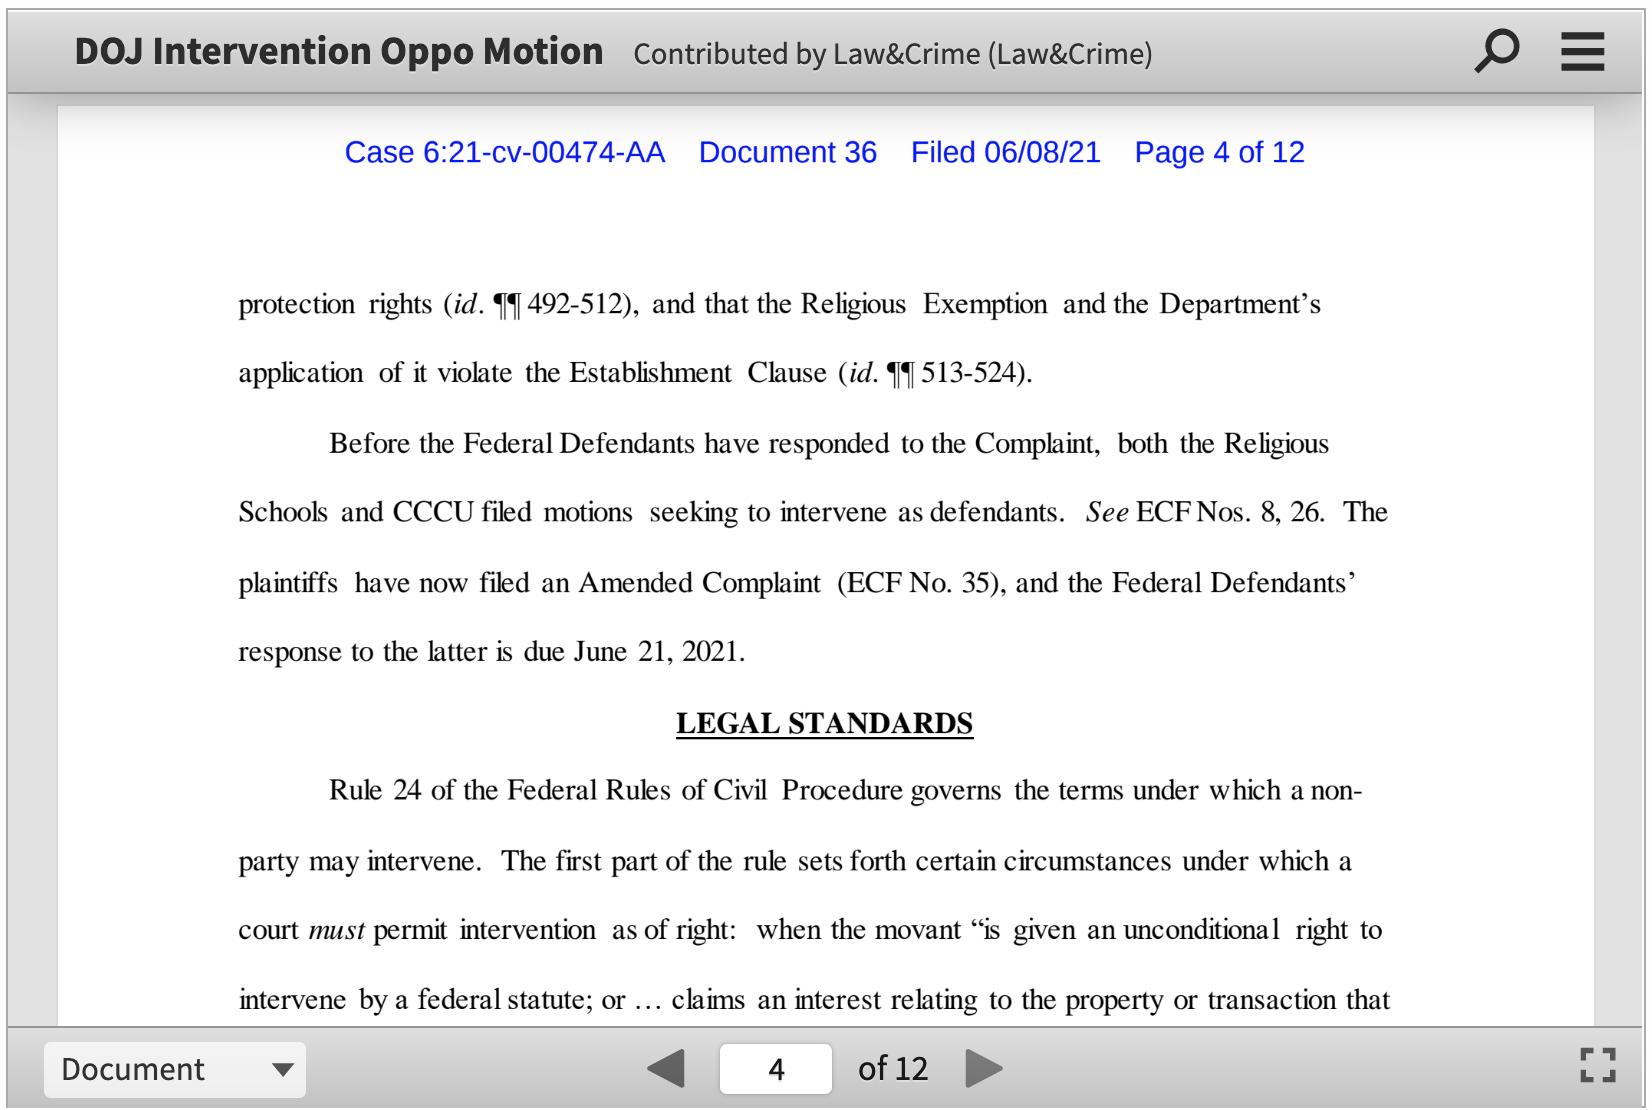 Screen-Shot-2021-06-09-at-6.31.50-PM Garland Defends Law That Lets Religious Schools Discriminate Against LGBTQ Featured Joe Biden LGBT Politics Top Stories